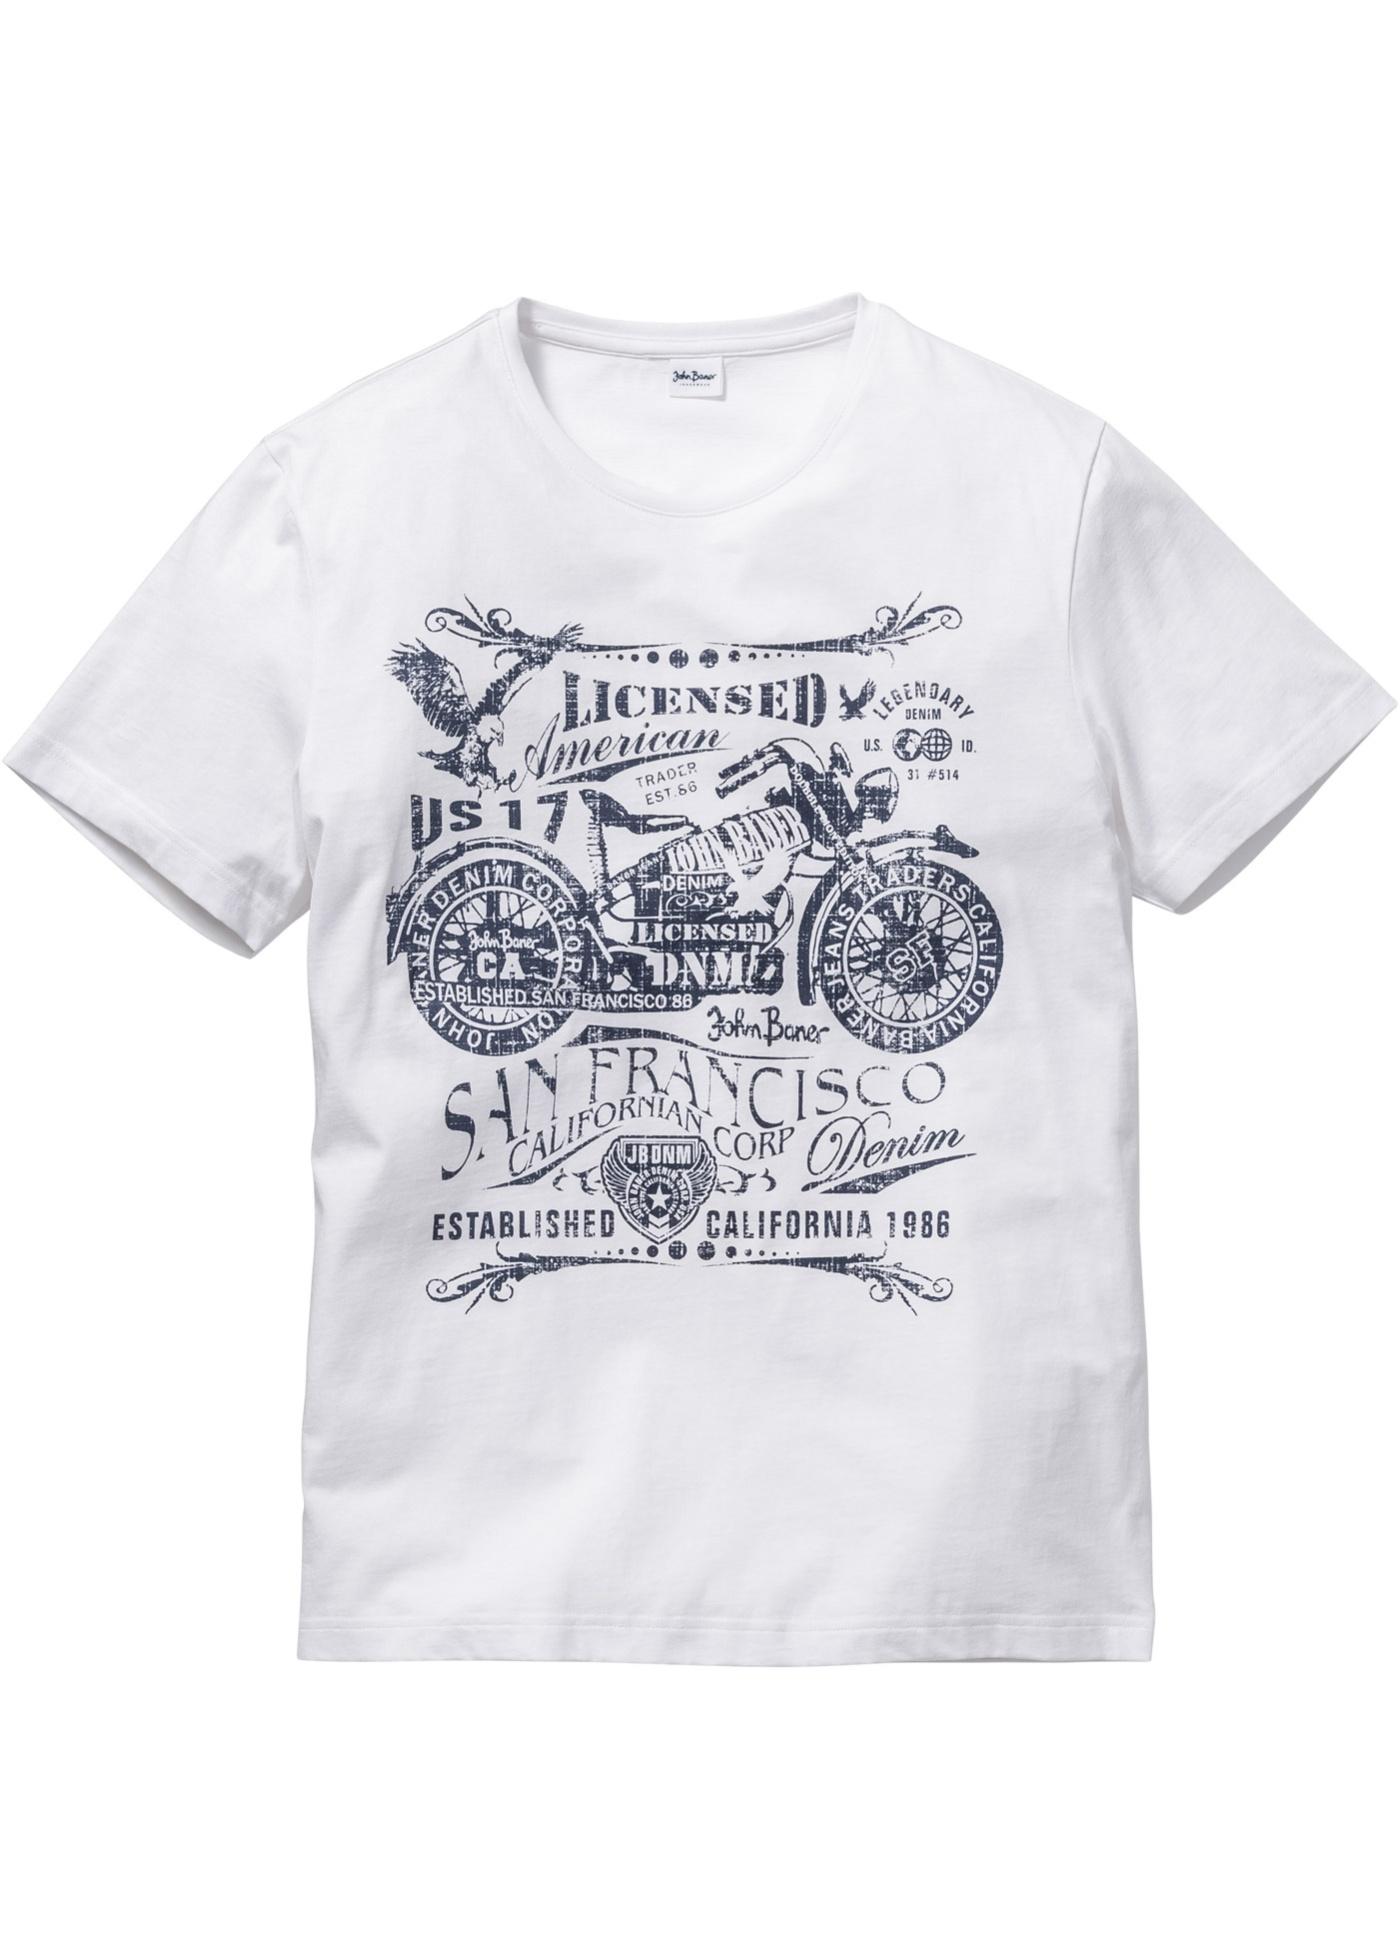 Bonprix - T-shirt 99.00